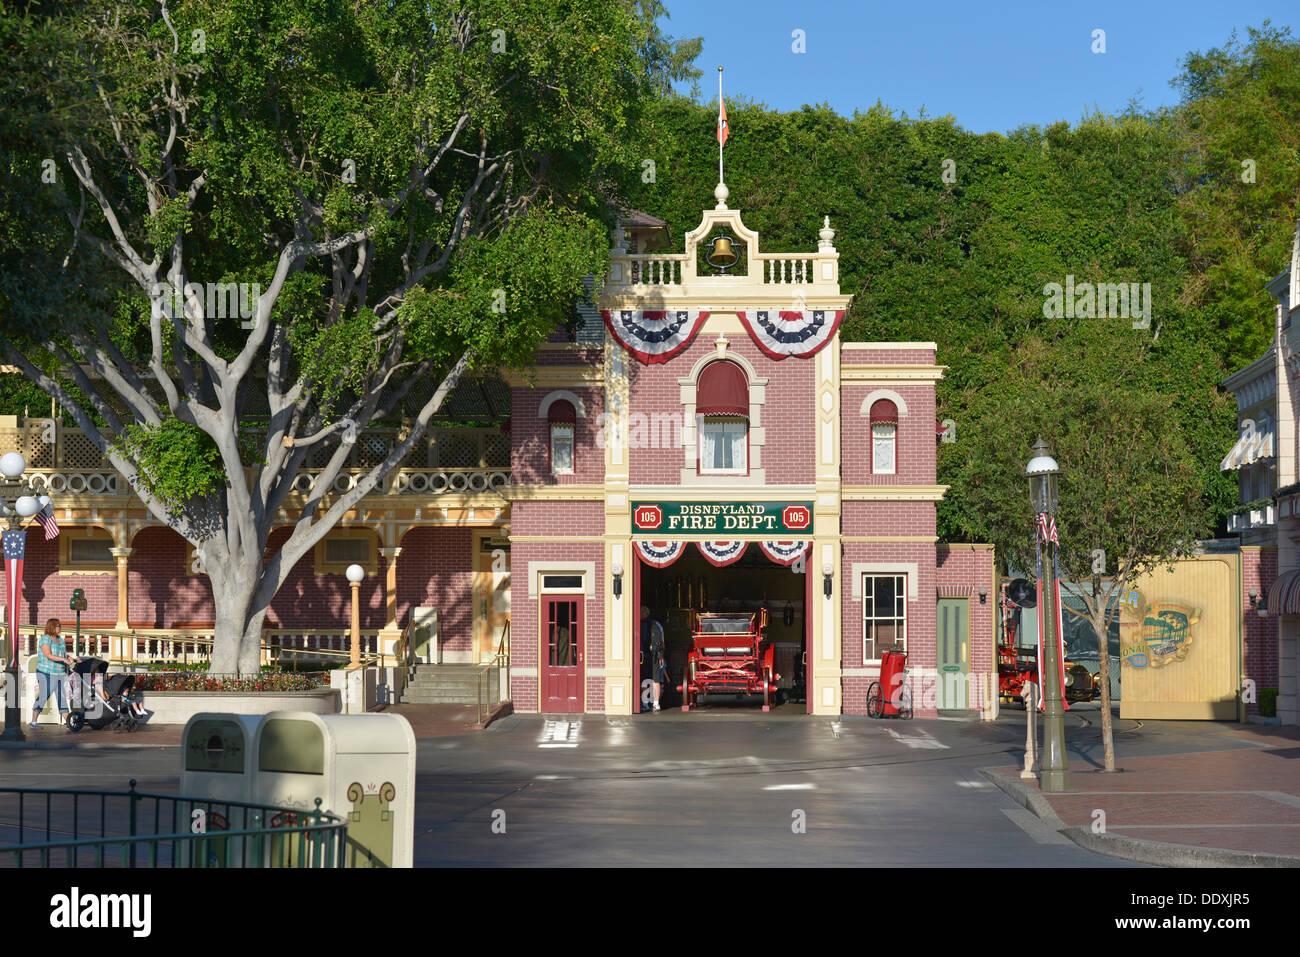 Walt Disney's Apartment above the Fire Dept., Disneyland Resort on Main Street, Anaheim, California - Stock Image